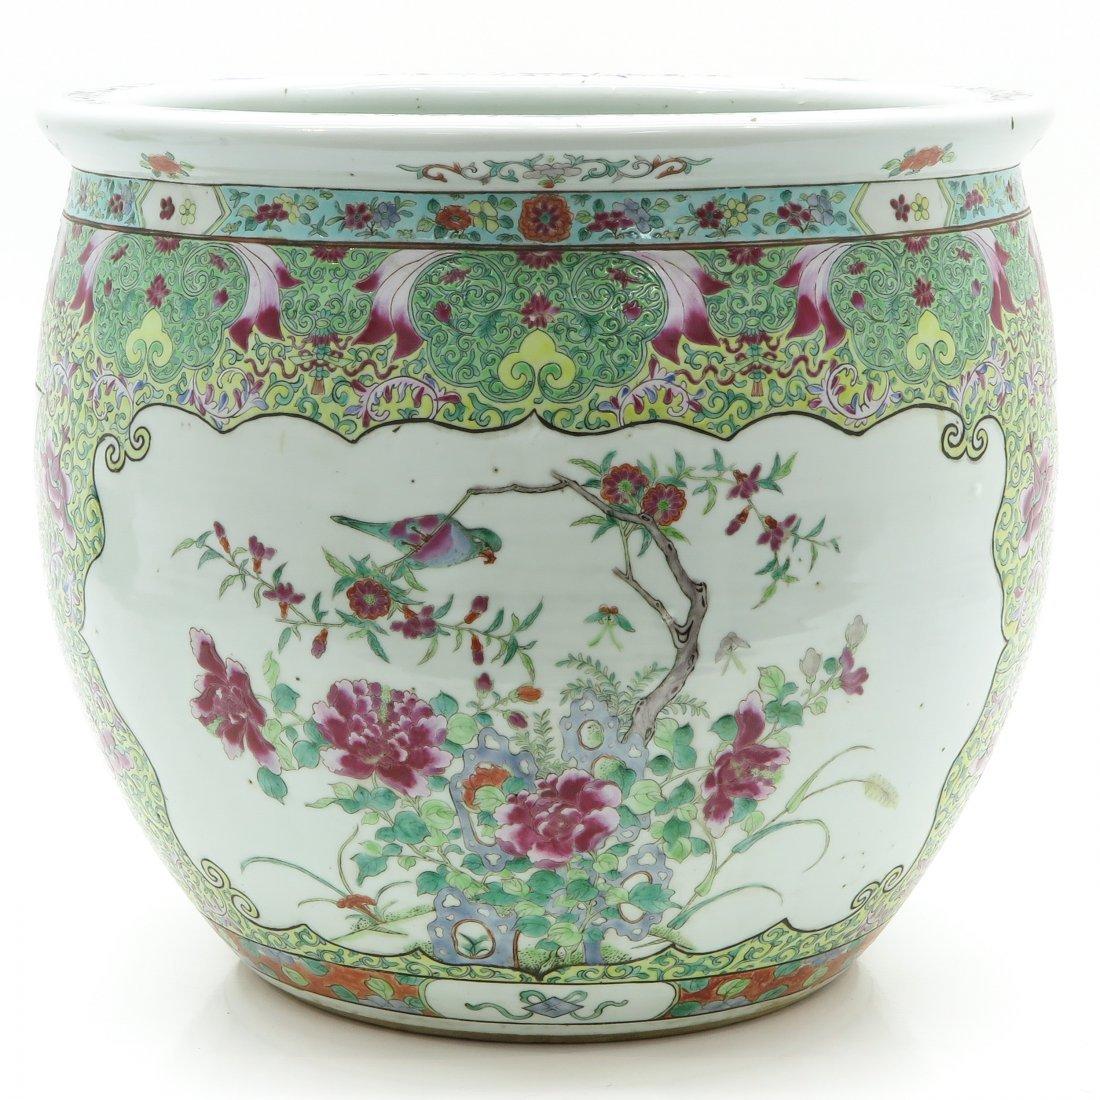 19th Century China Porcelain Wucai Decor Fish Bowl